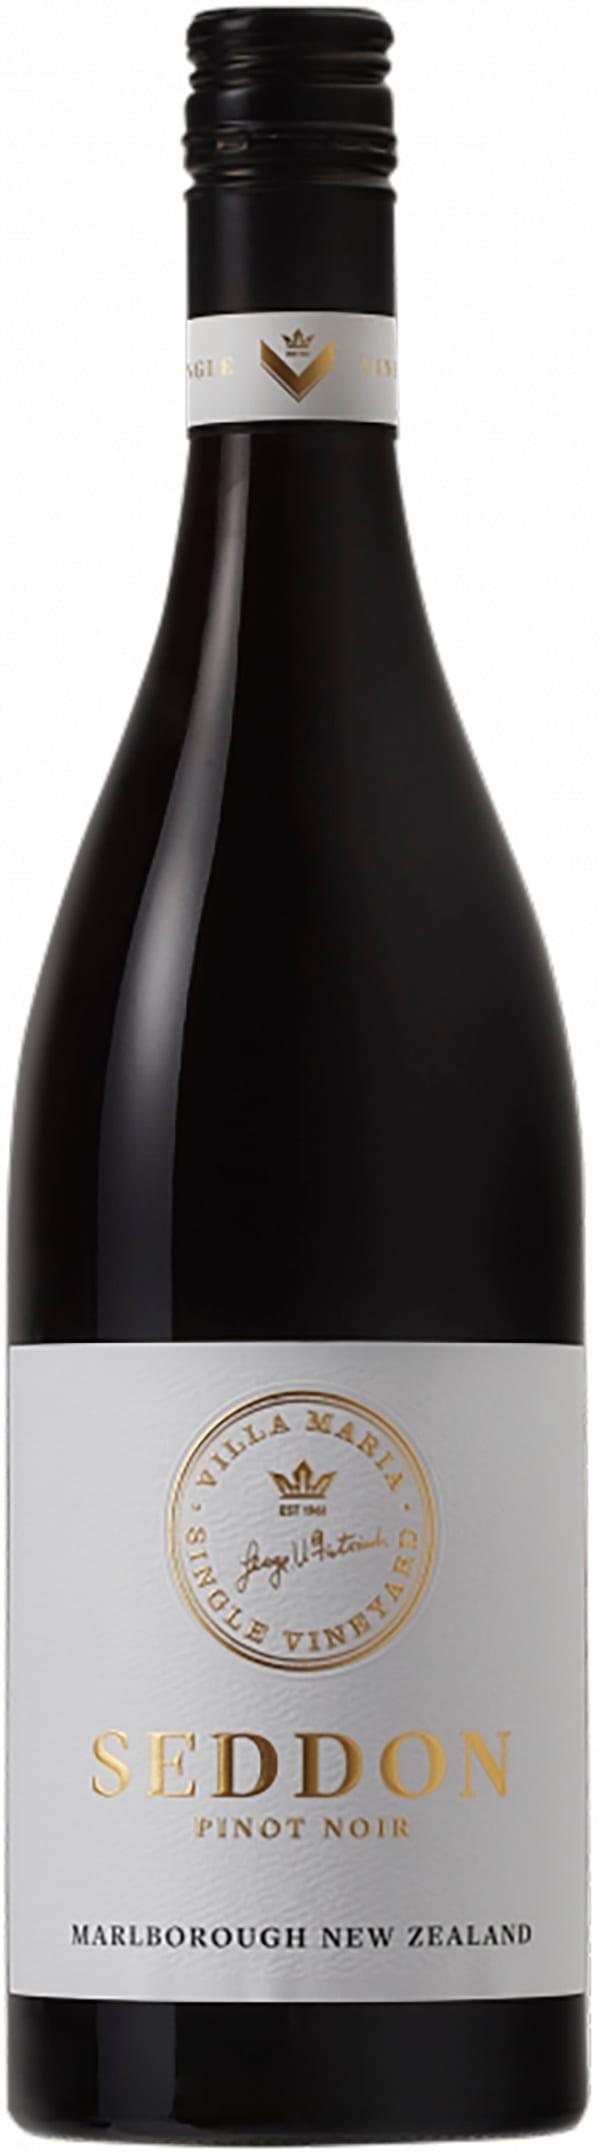 Villa Maria Seddon Vineyard Pinot Noir 2015